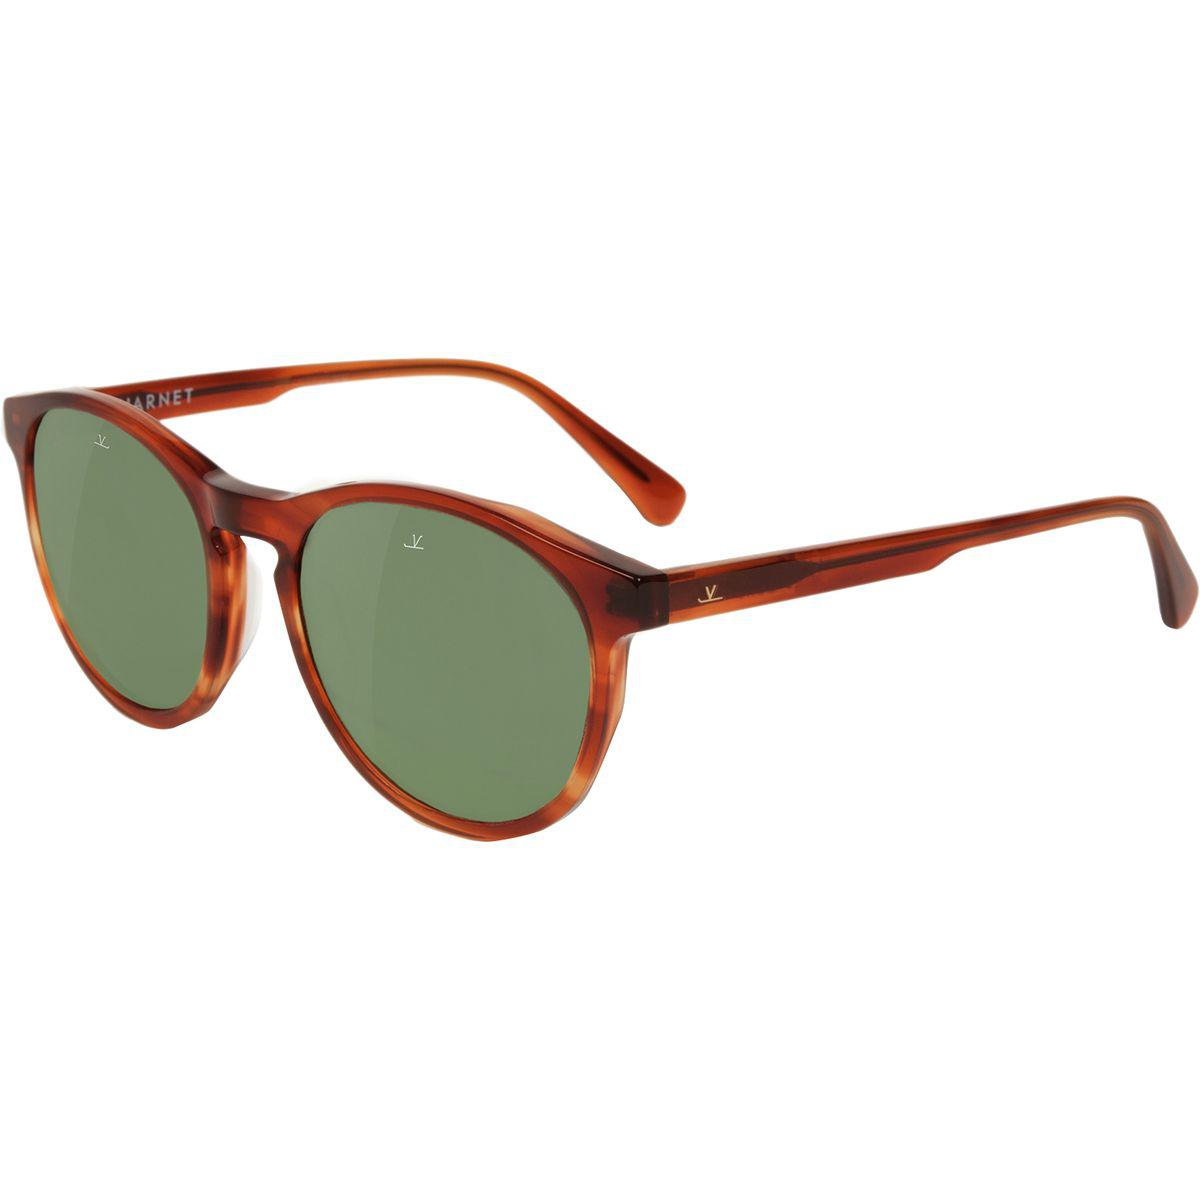 21d98ee8fd0 Lyst - Vuarnet Vl 1616 Sunglasses in Brown for Men